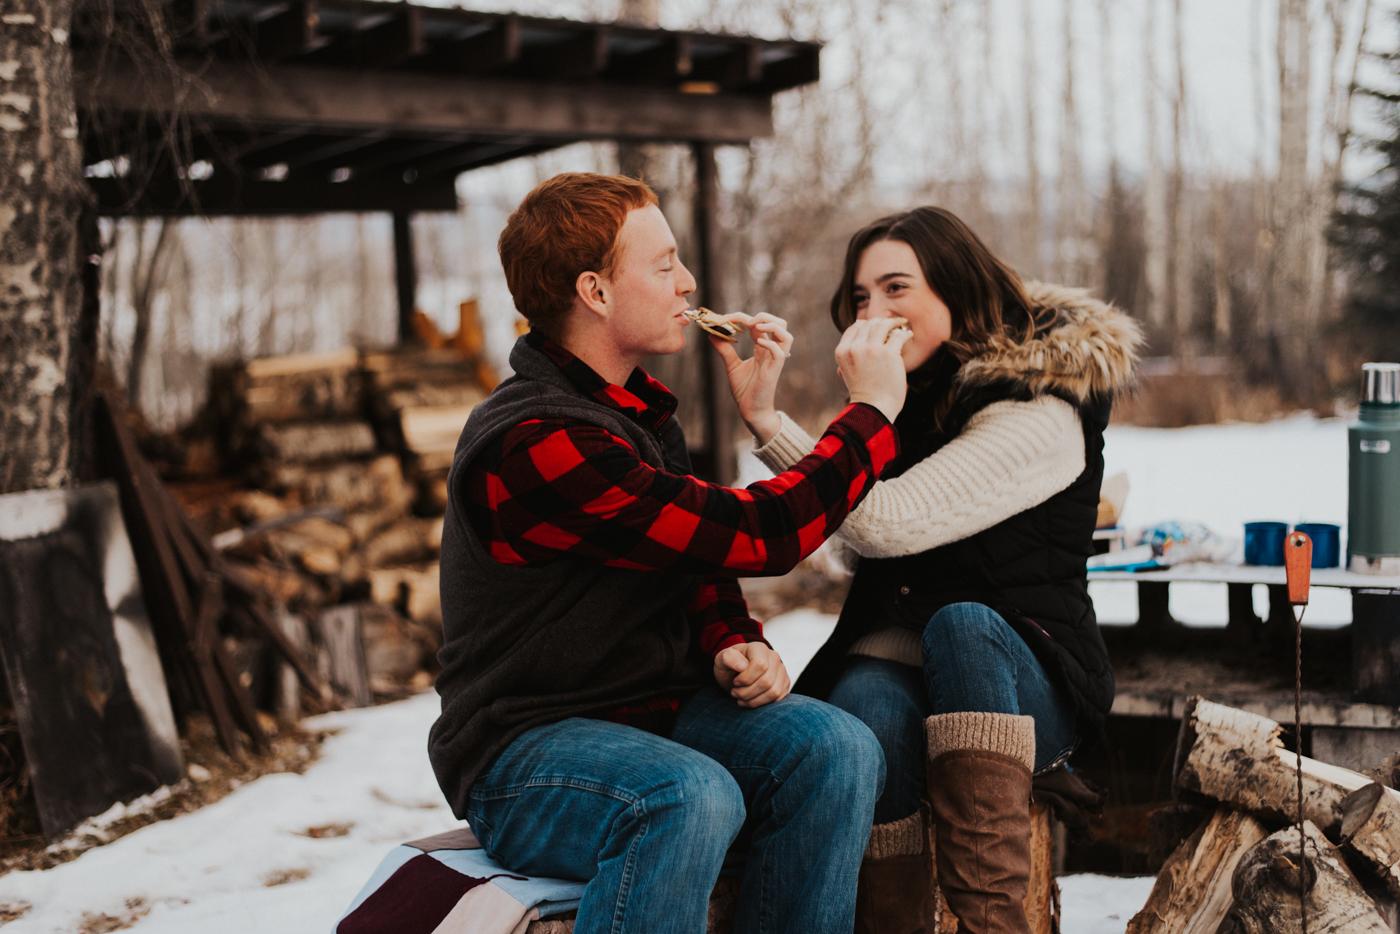 FortSt.John_photographer_TyraEPhotography_Wedding_Couple_Family_Photograhy_DawsonCreek_Elopement_Bride_Boduoir_Portraits-7367.jpg